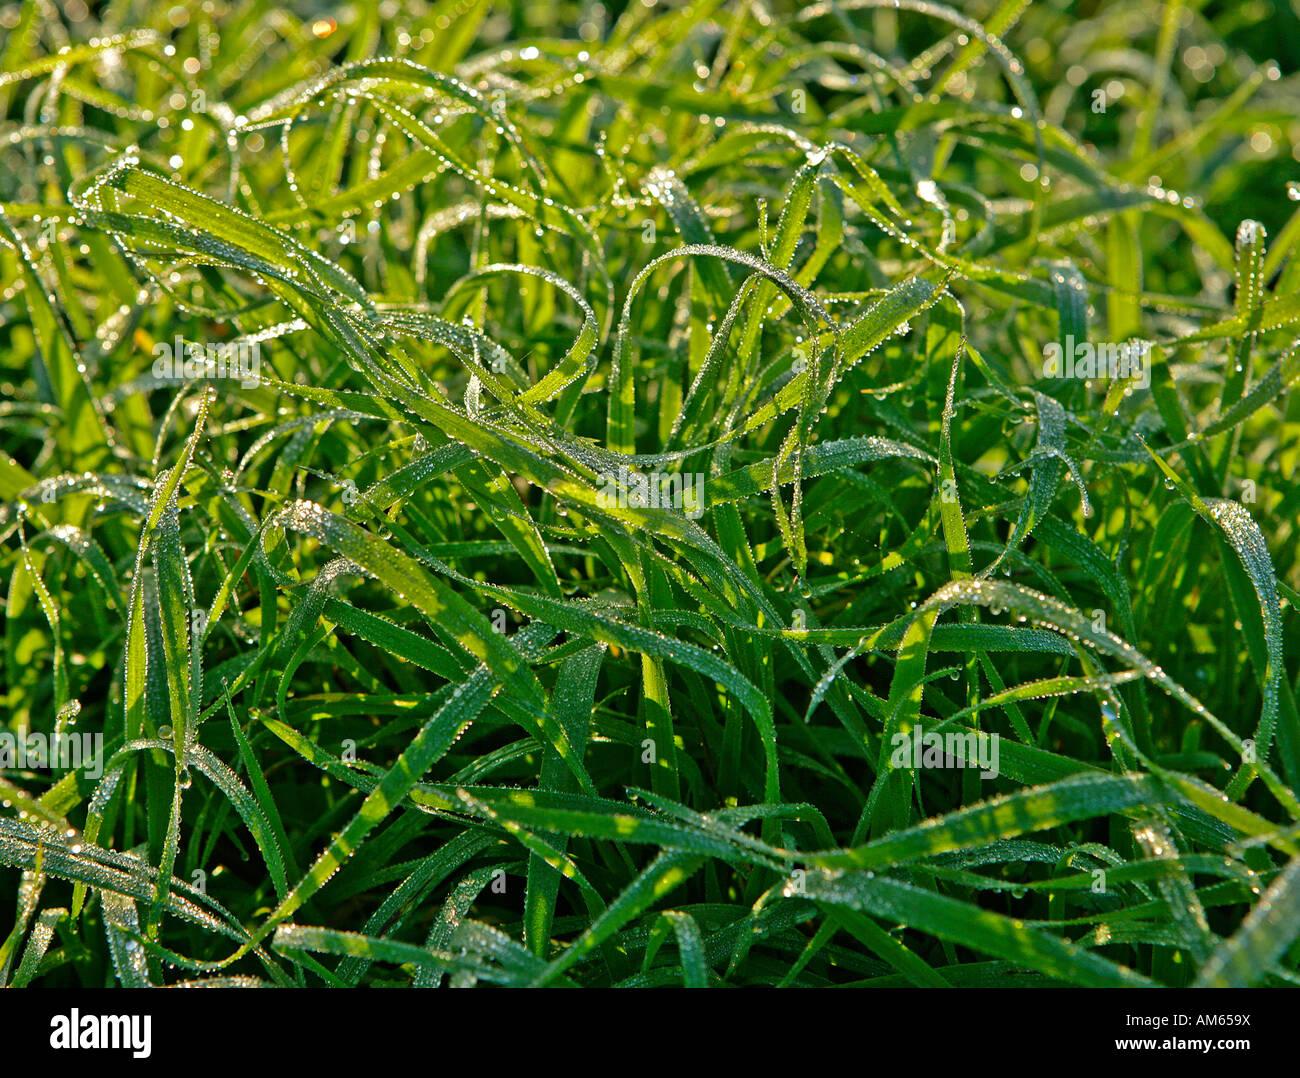 Lame di erba con gocce di rugiada Immagini Stock